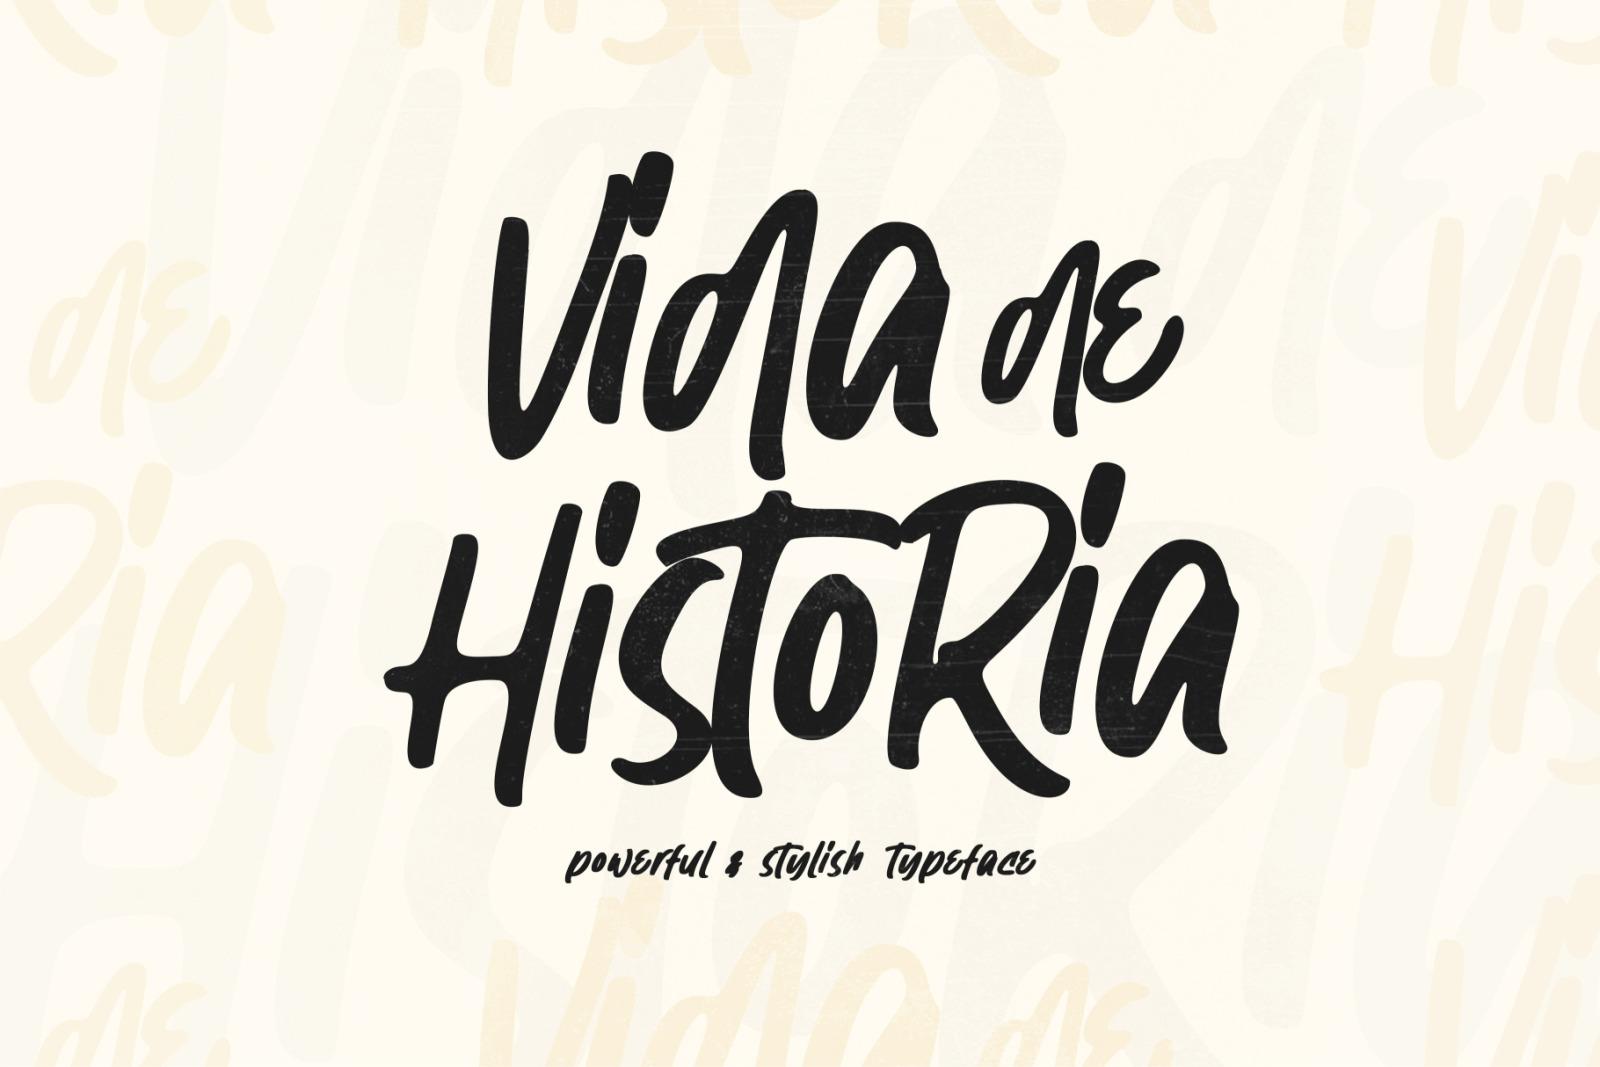 Vida de Historia - Stylish Typeface